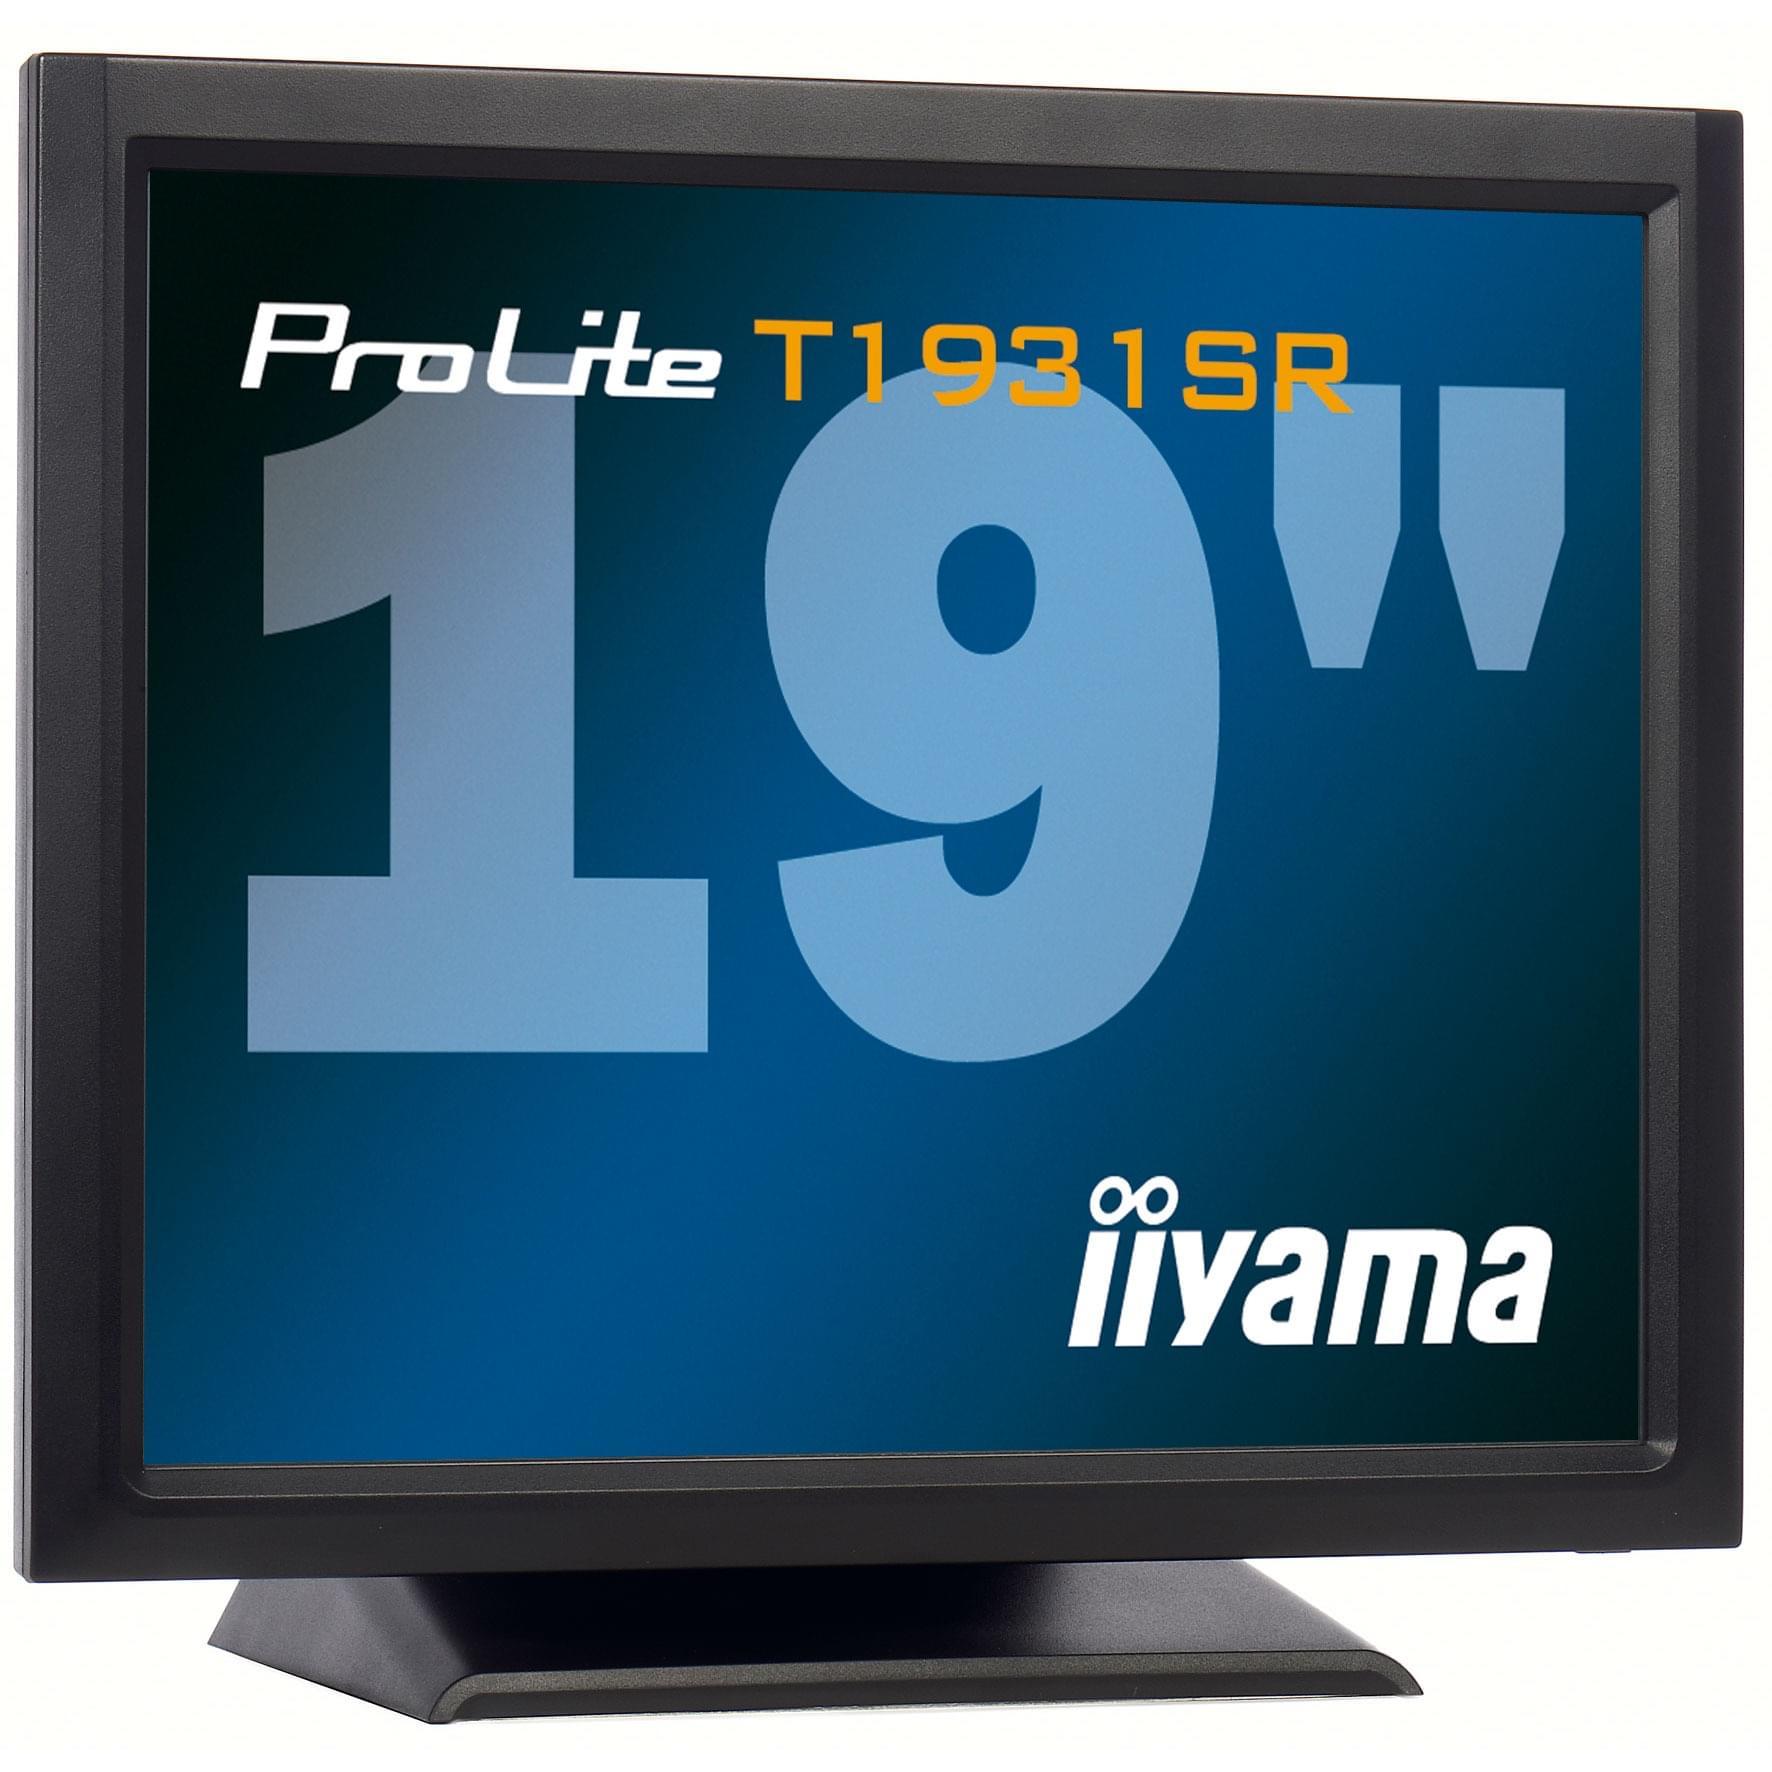 Iiyama PLT1931SR-B1 (PLT1931SR-B1) - Achat / Vente Ecran PC sur Cybertek.fr - 0